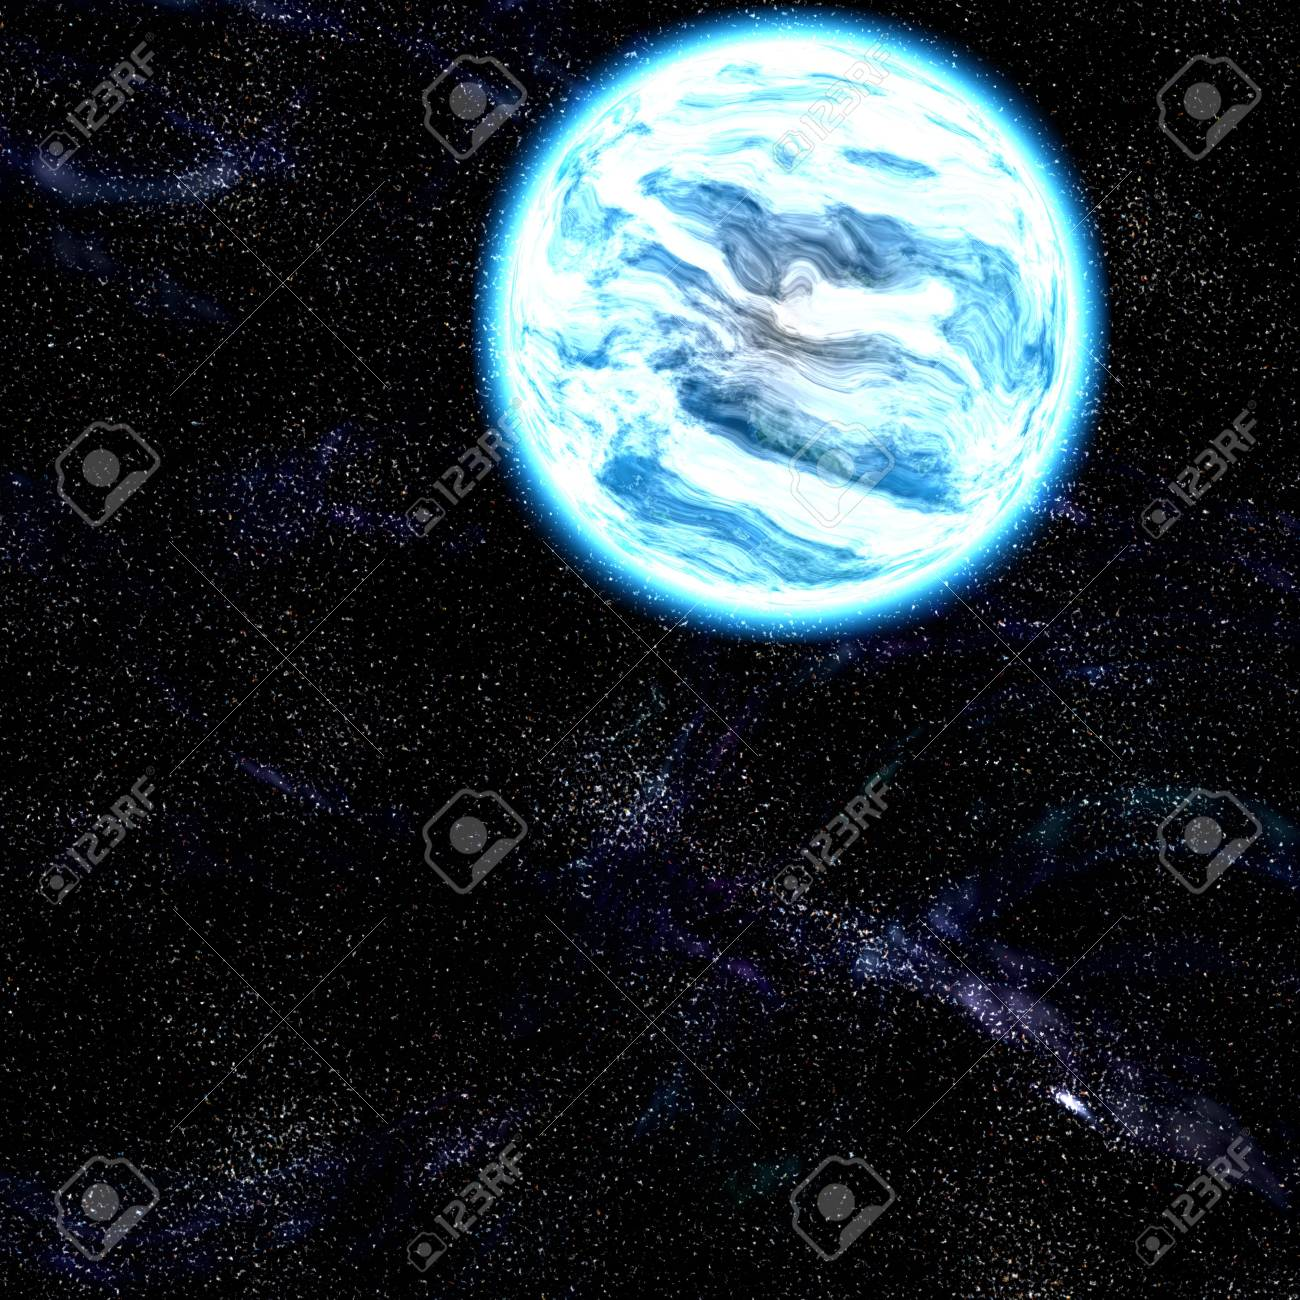 Science fiction planet complex space scene illustration Stock Photo - 5560451